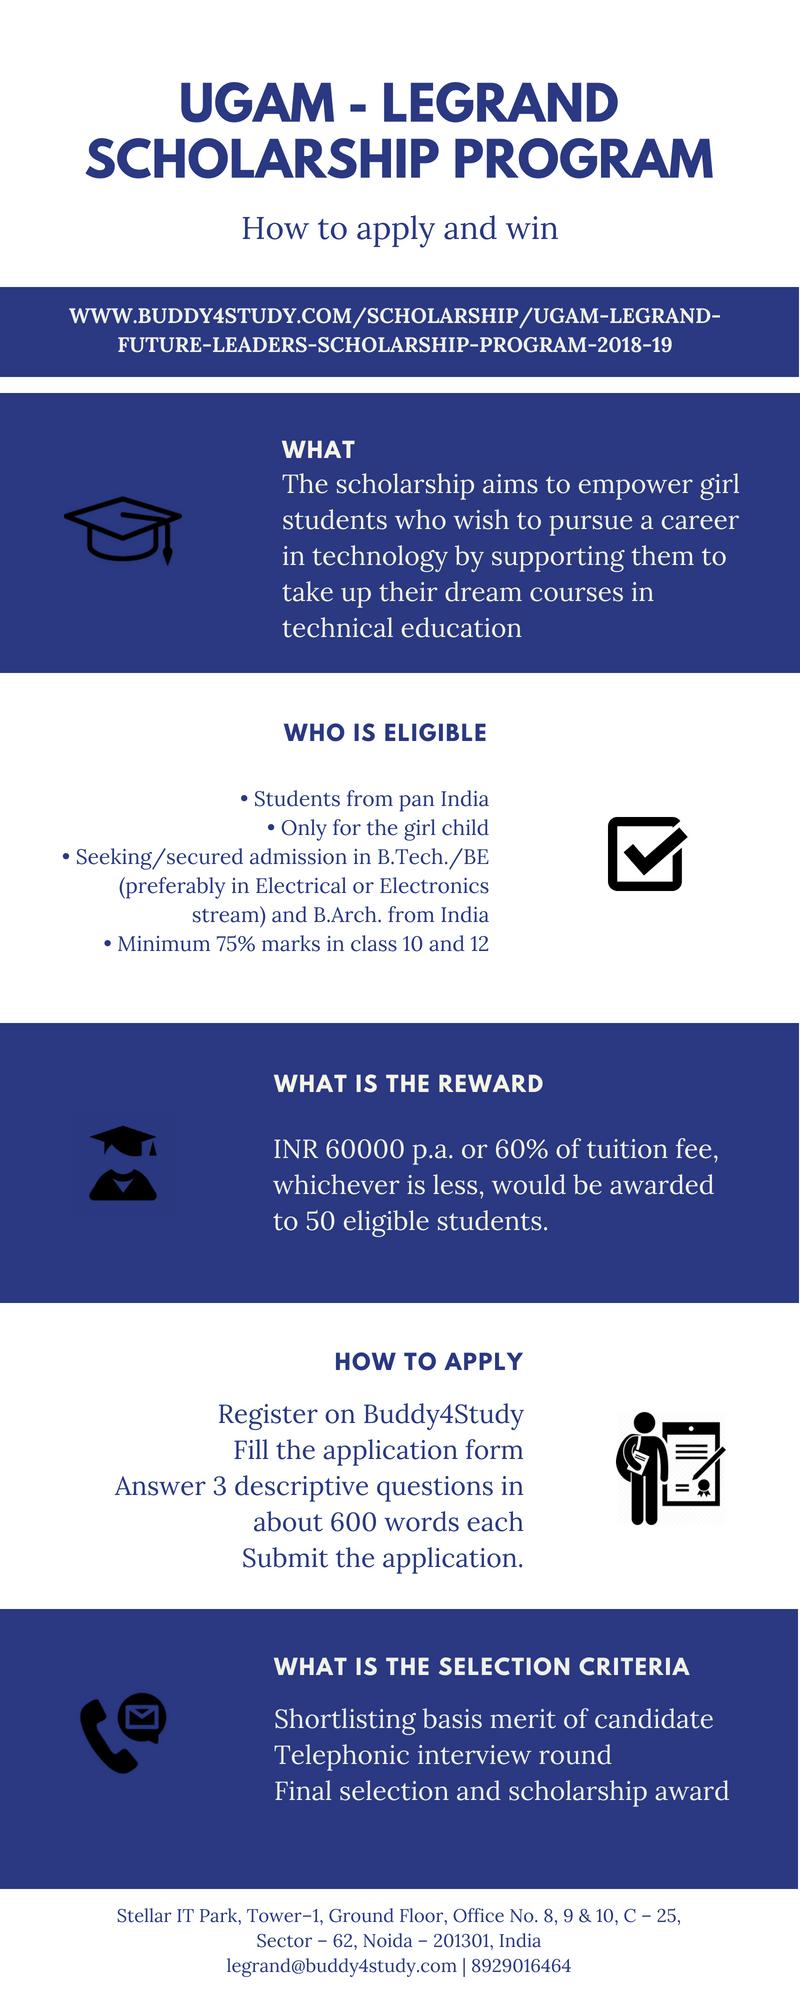 UGAM - Leagrand Scholarship Program